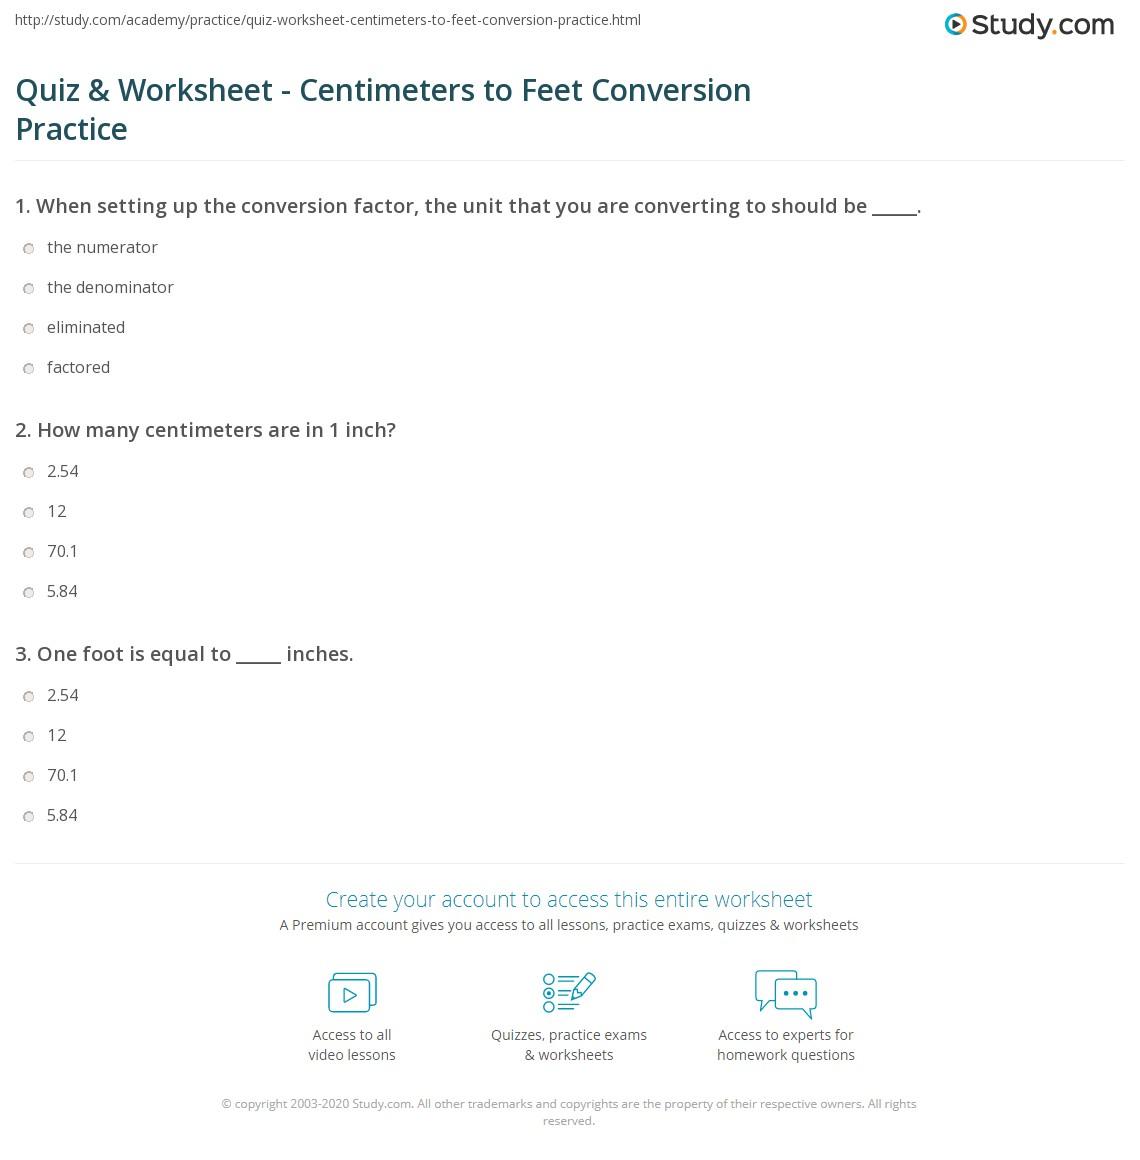 quiz worksheet centimeters to